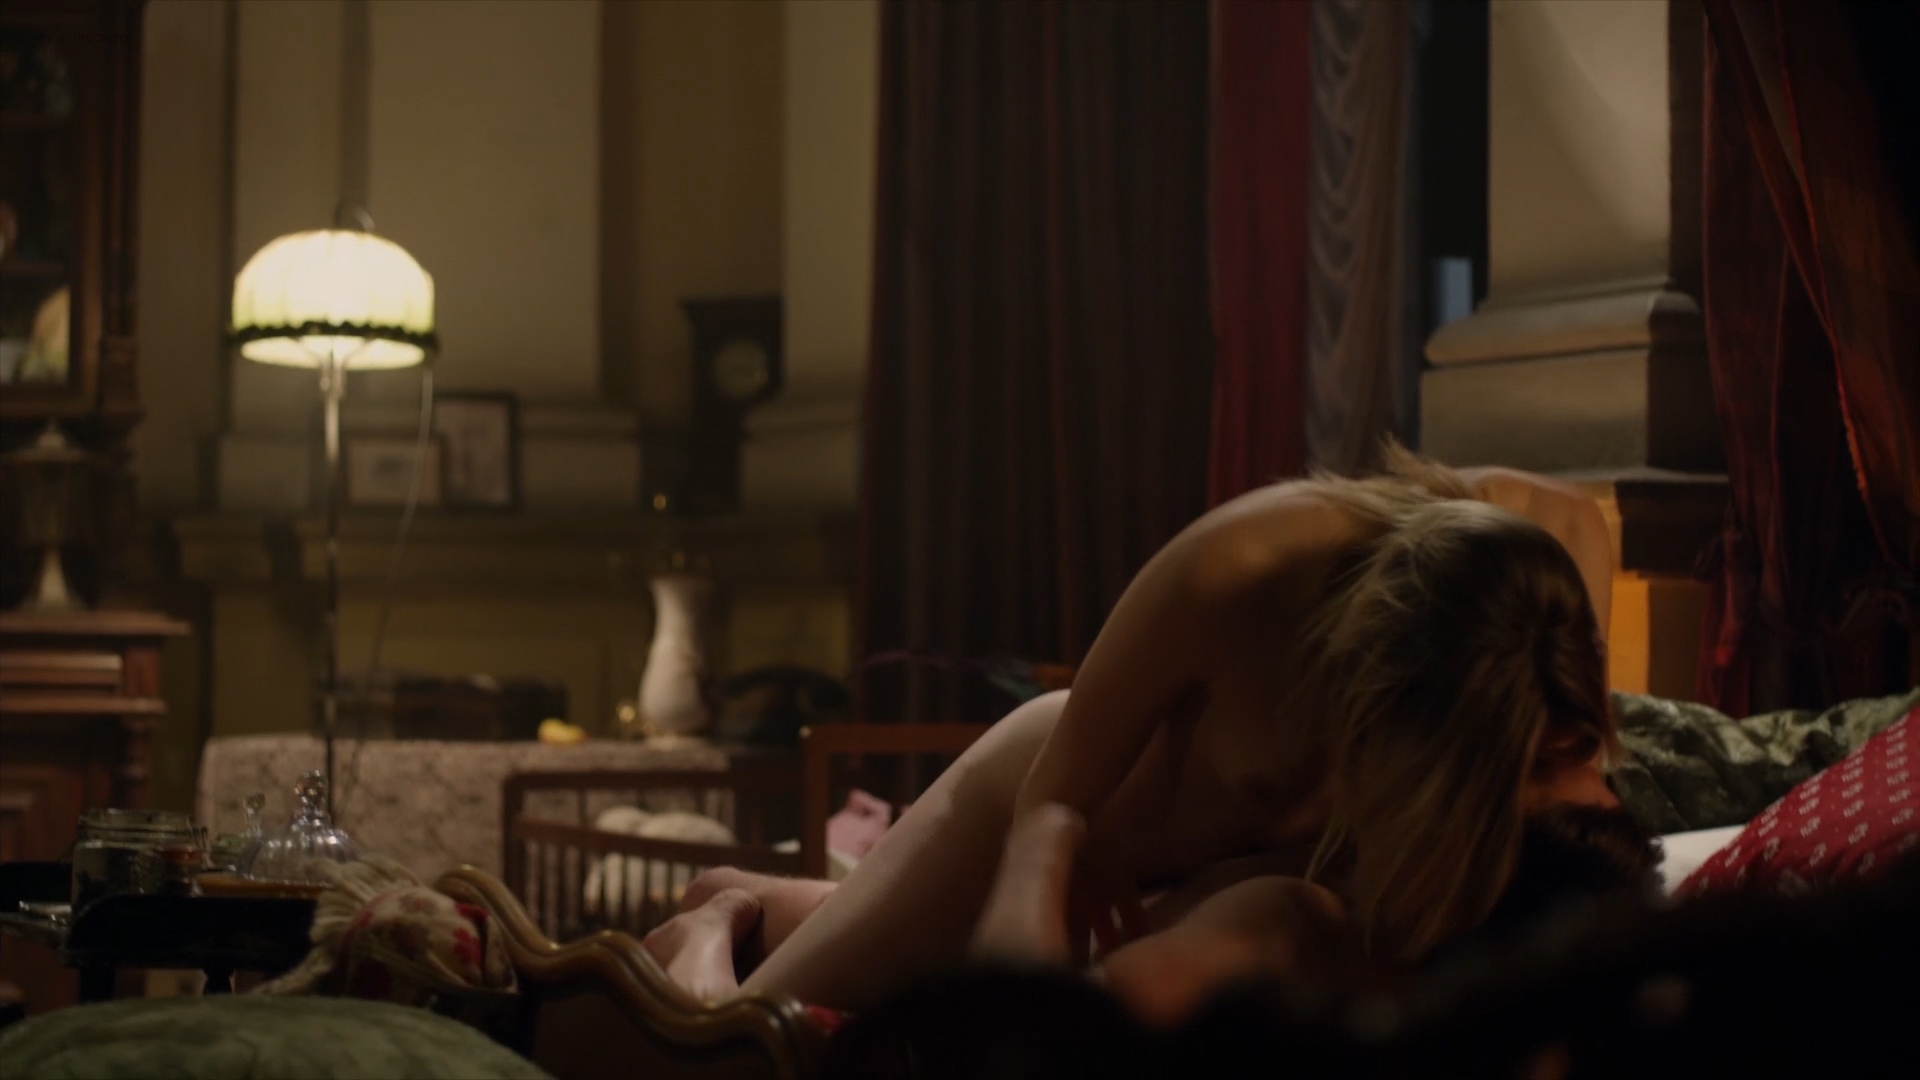 Sadie Katz nude Roxanne Pallett nude sex and others nude - Wrong Turn 6 Last_Resort (2014) hd1080p (6)